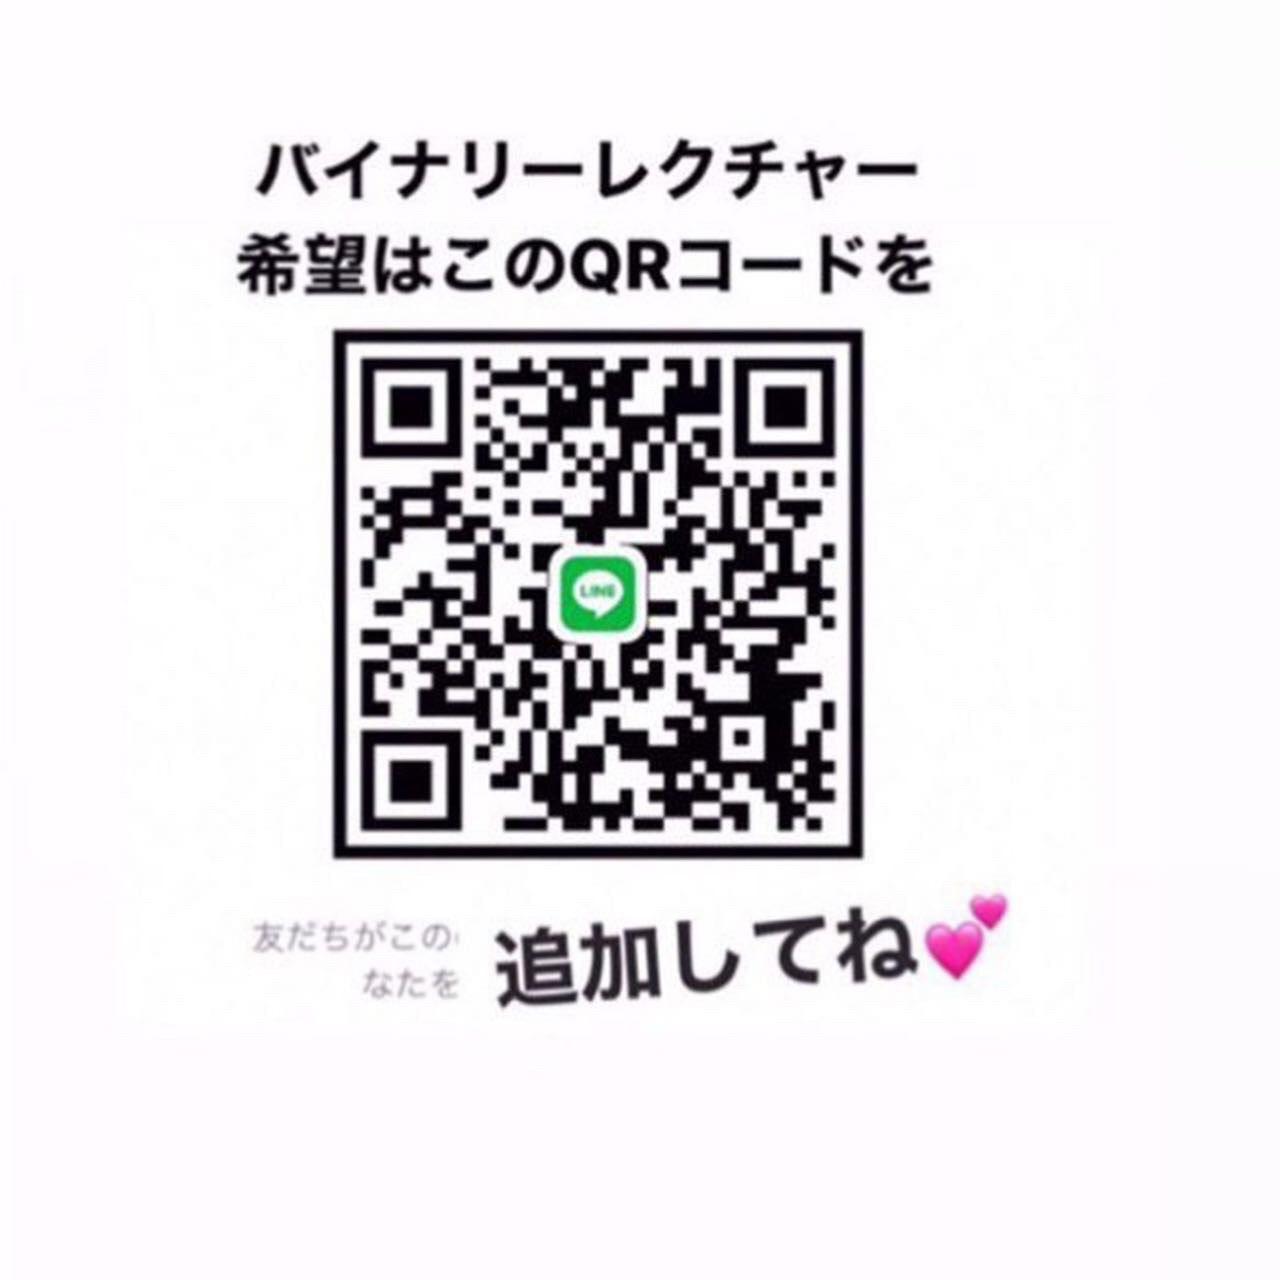 photo_2020-04-16_15-39-55.jpg